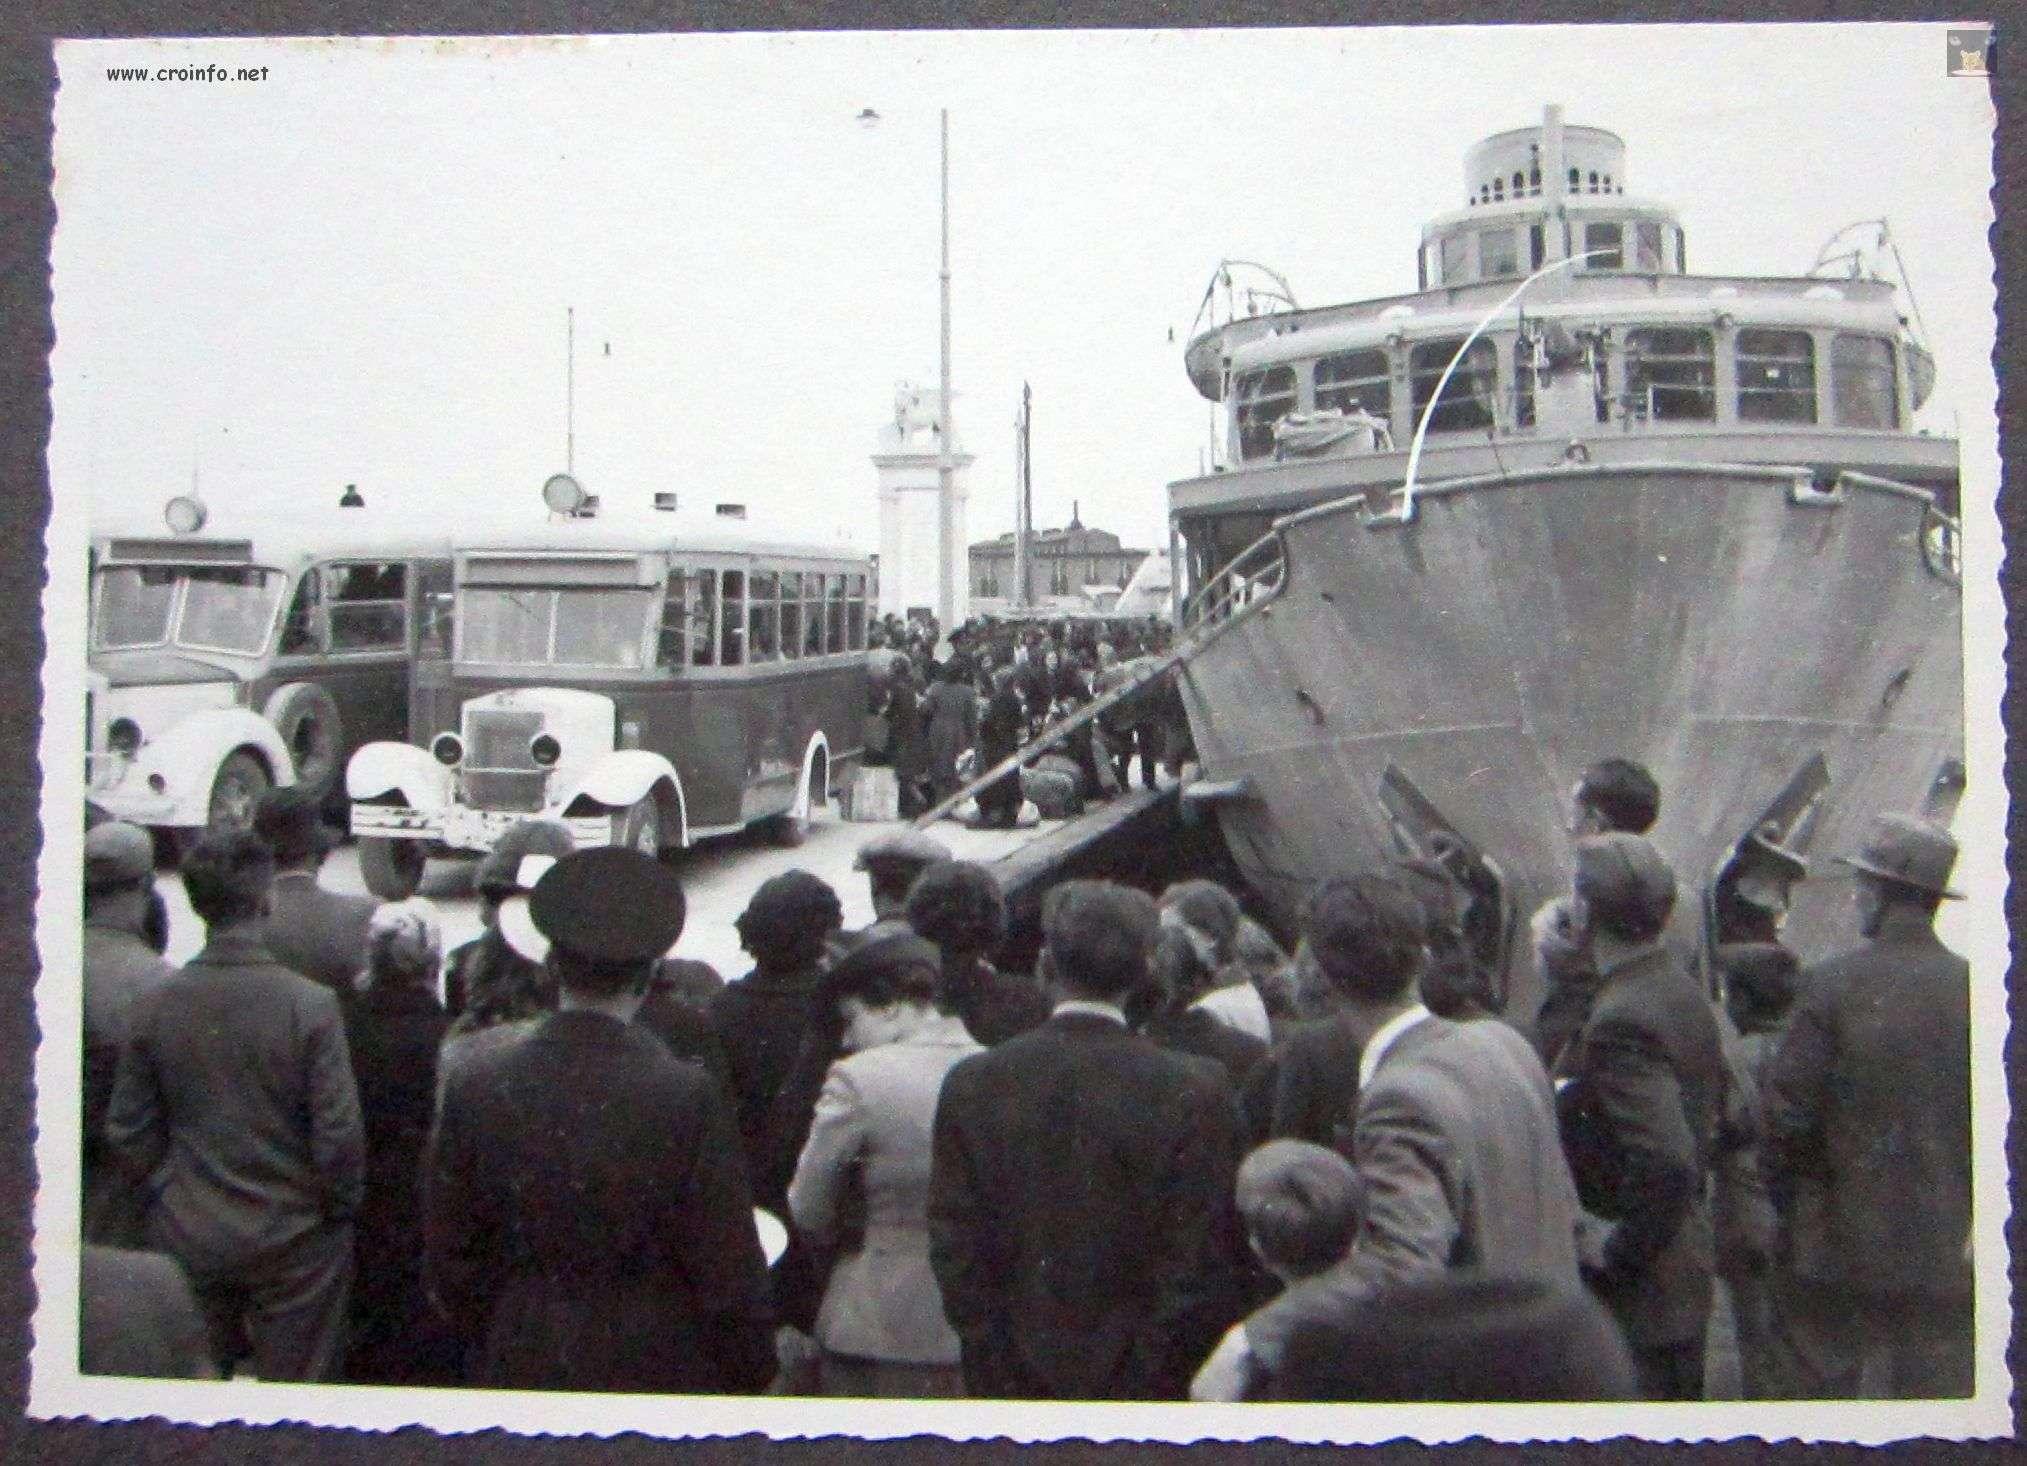 laurana 11.04.1941. mletački lav frecia fiume rijeka luka